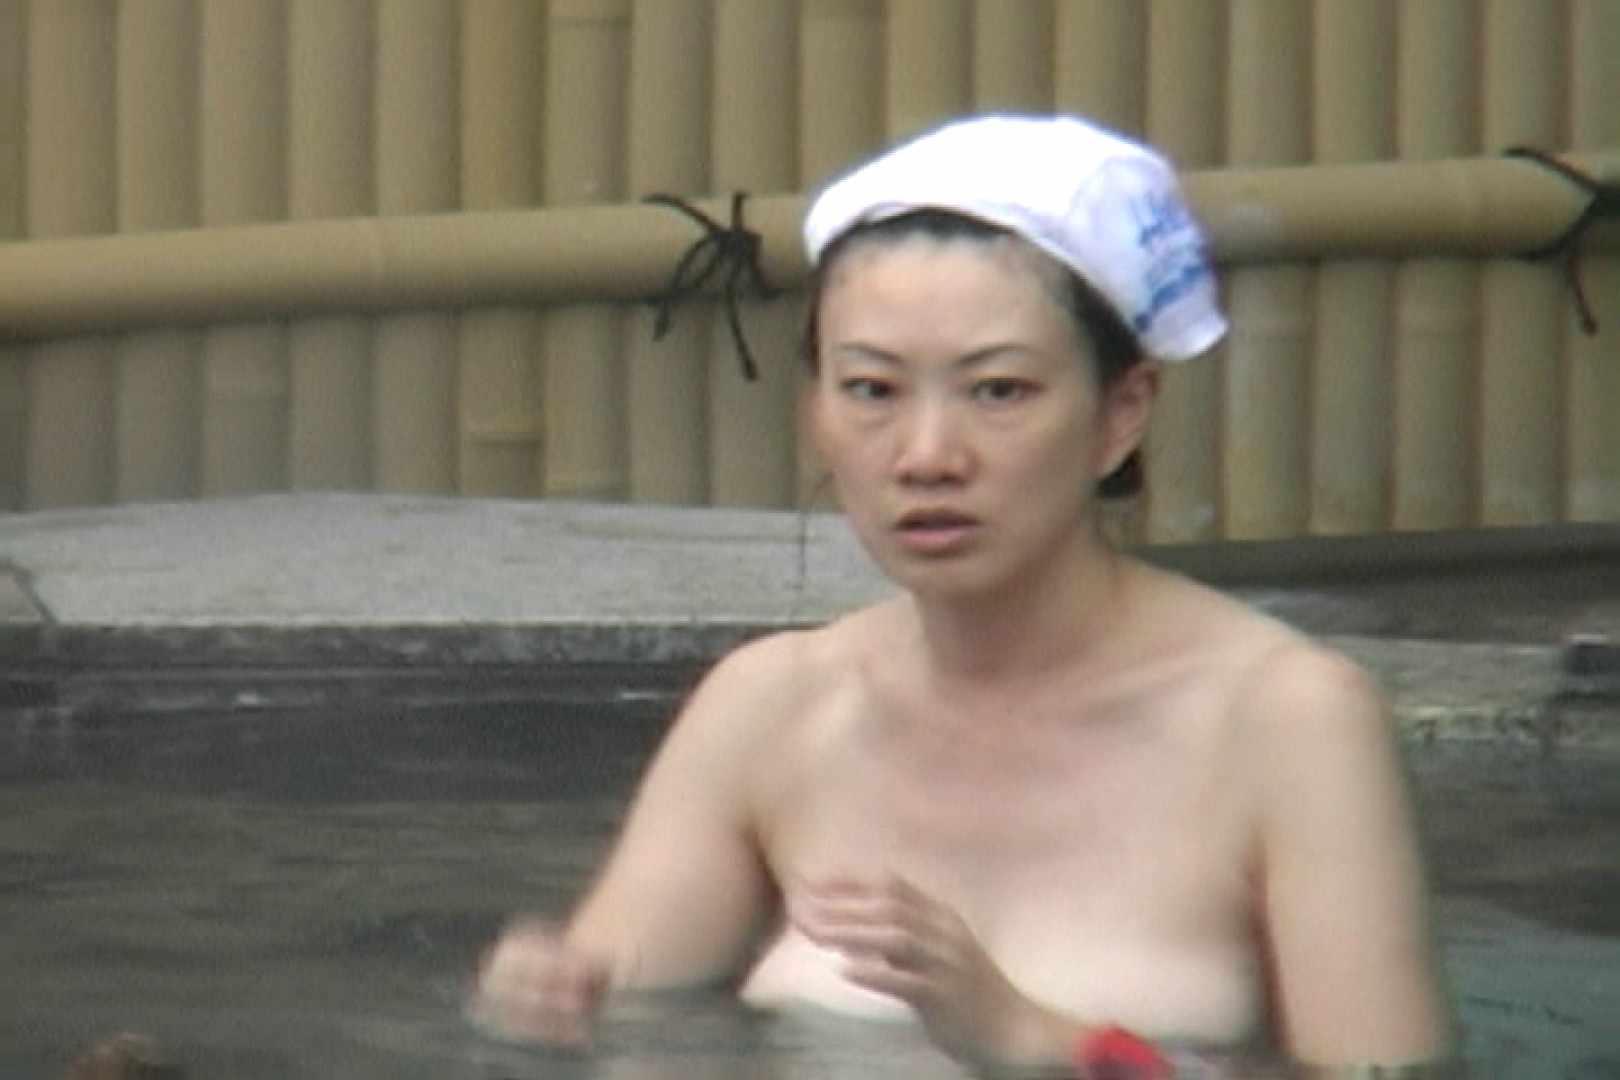 Aquaな露天風呂Vol.547 盗撮 エロ無料画像 100枚 23